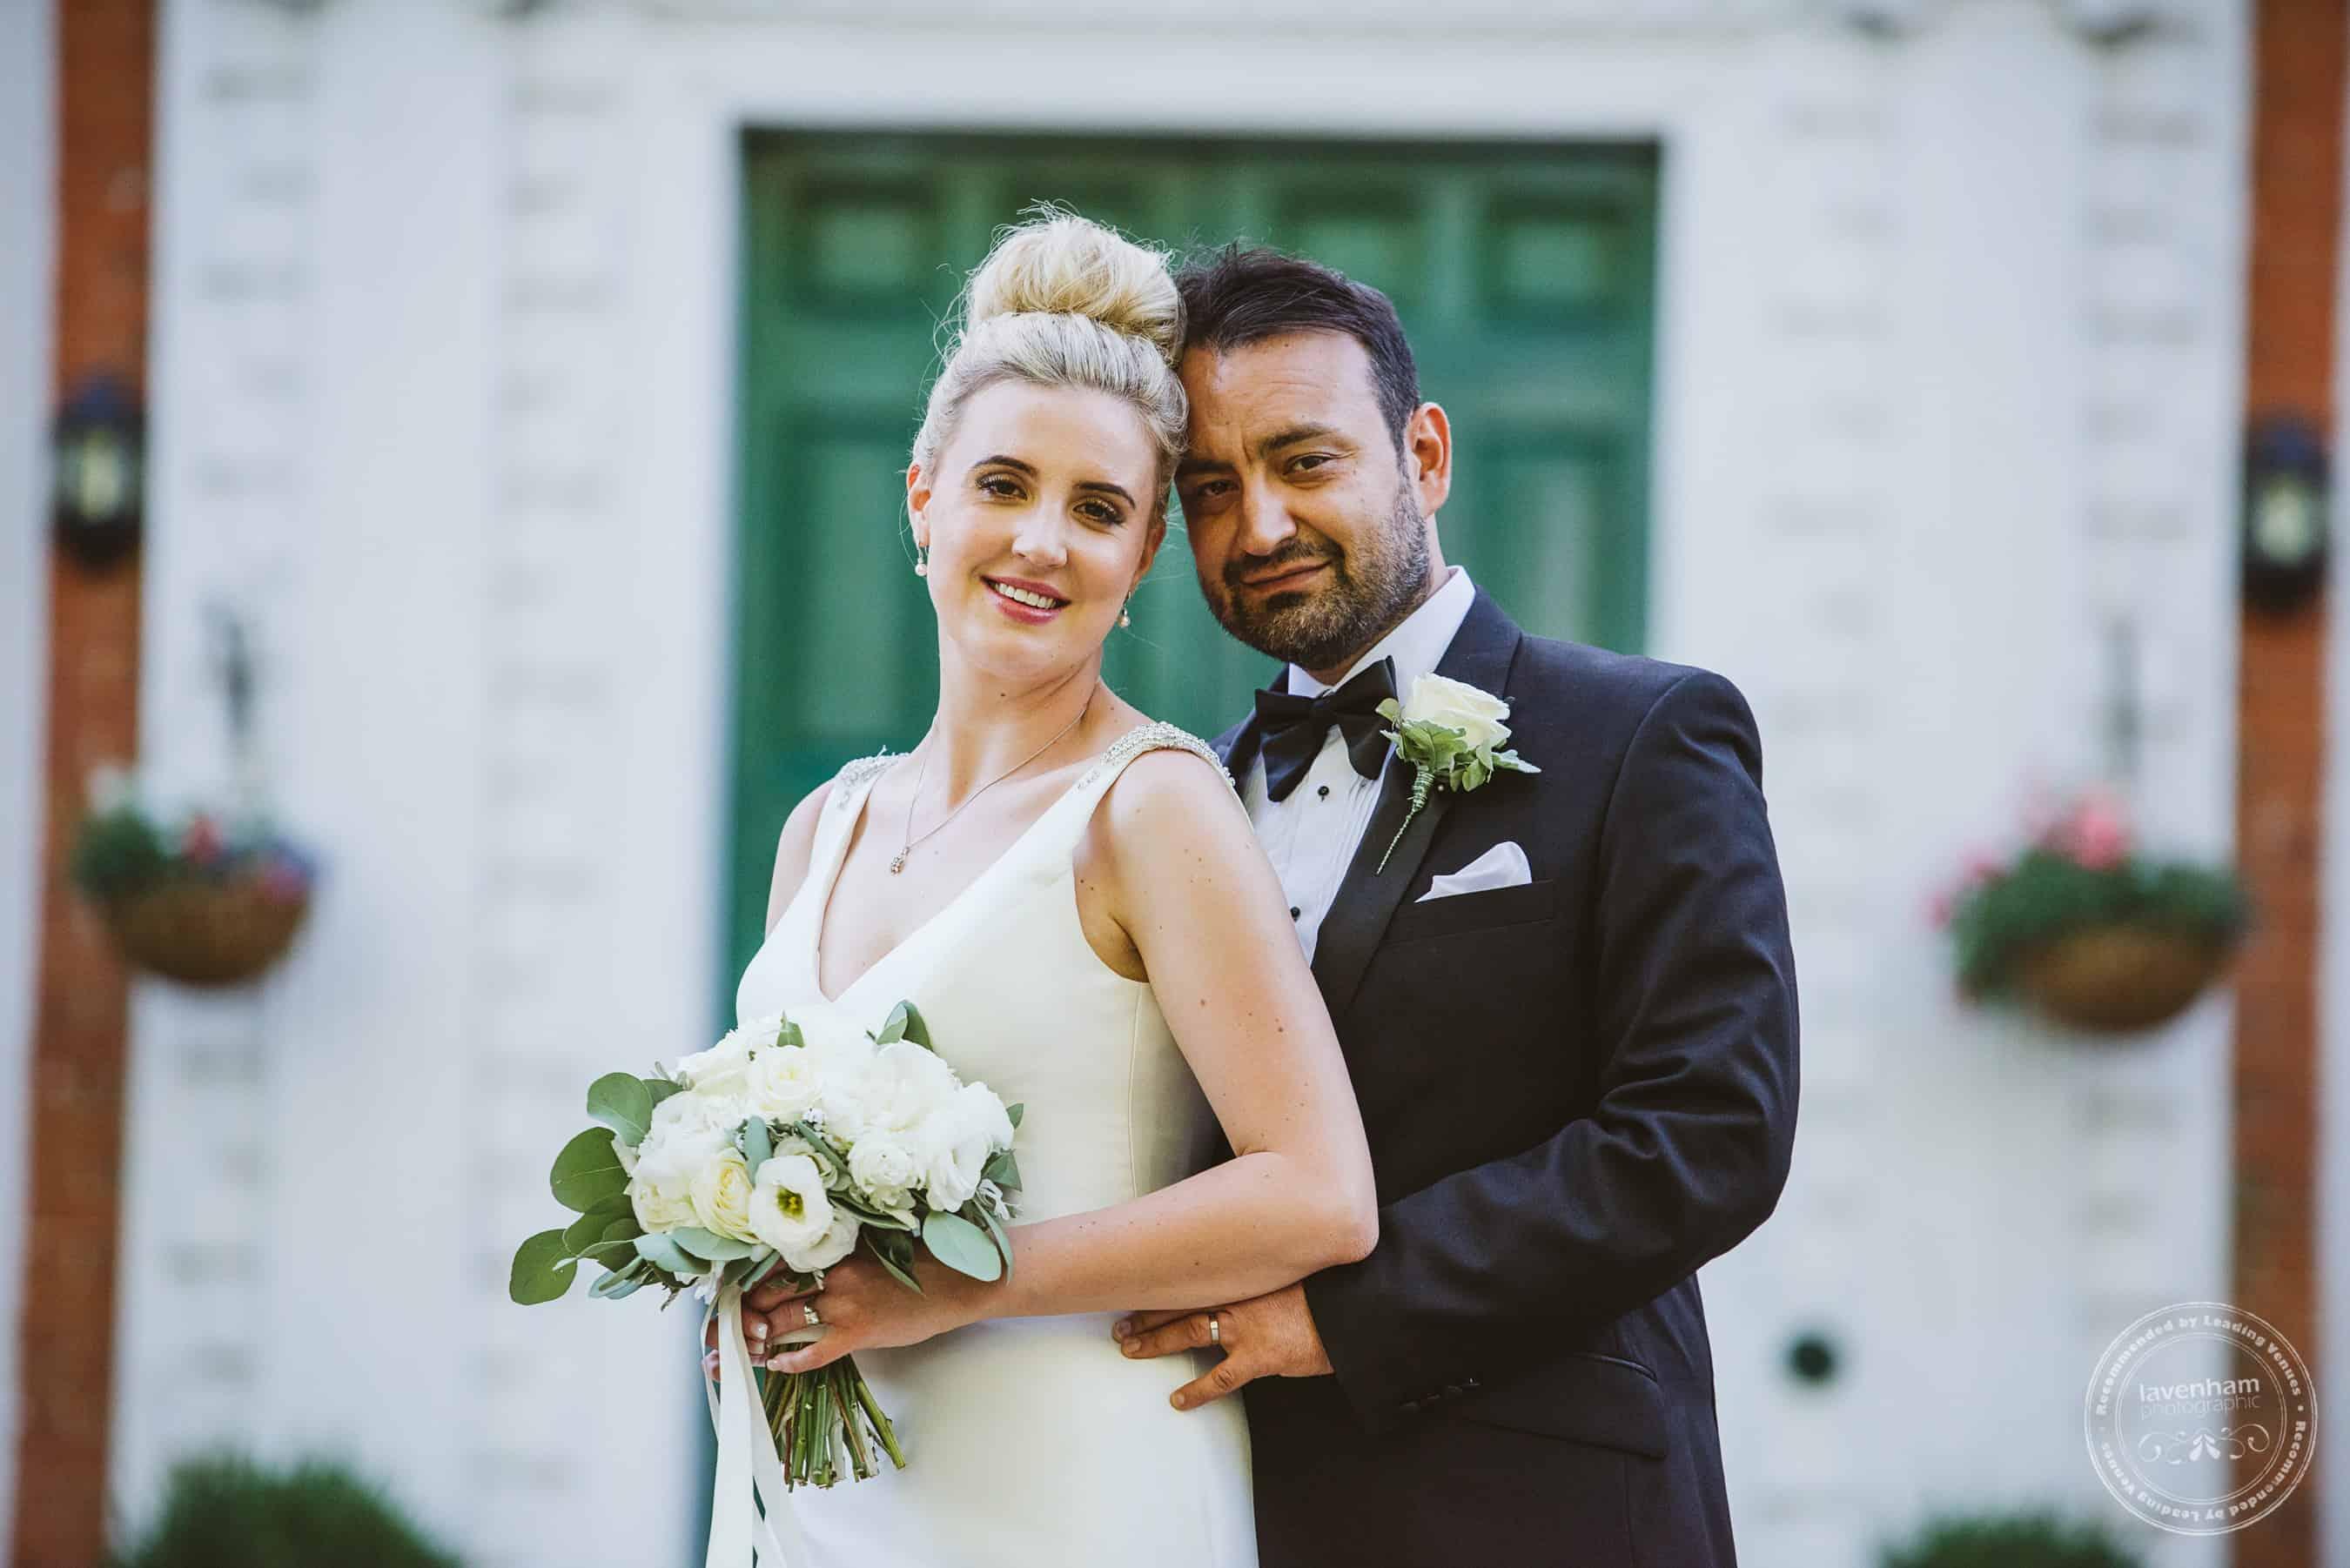 220618 Gosfield Hall Wedding Photography Lavenham Photographic 0153